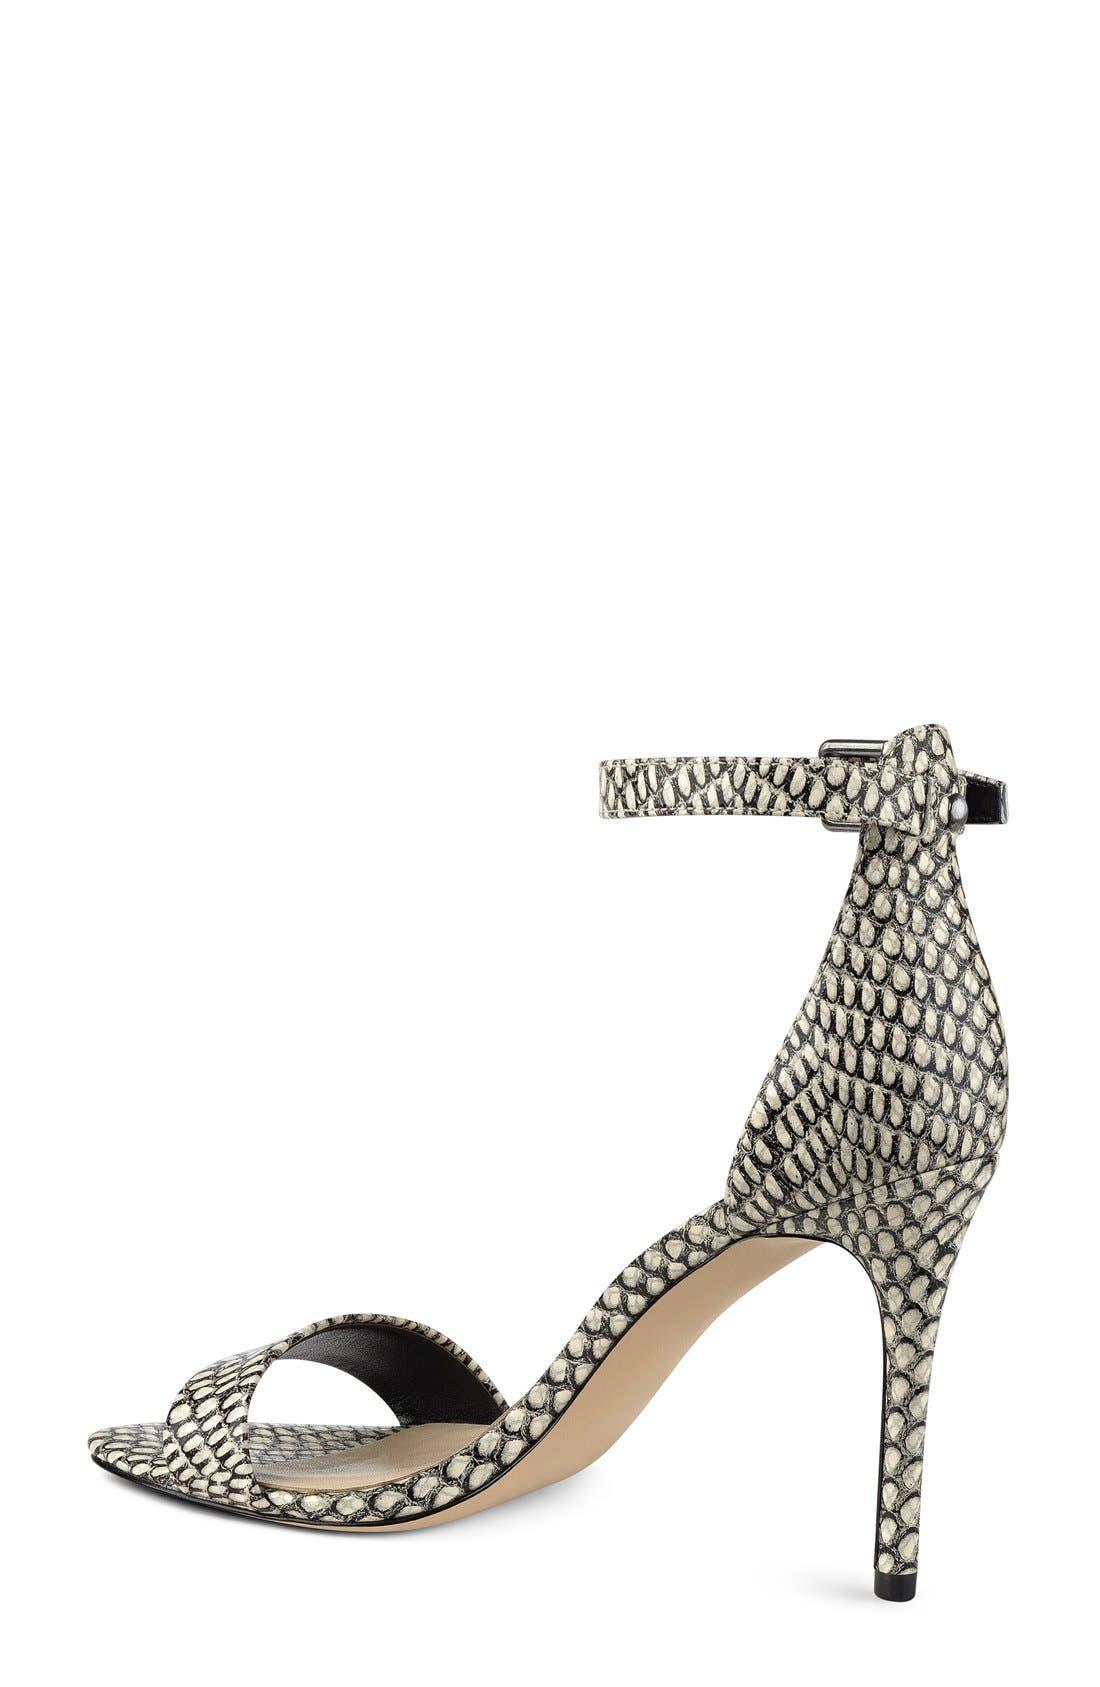 'Mana' Ankle Strap Sandal,                             Alternate thumbnail 8, color,